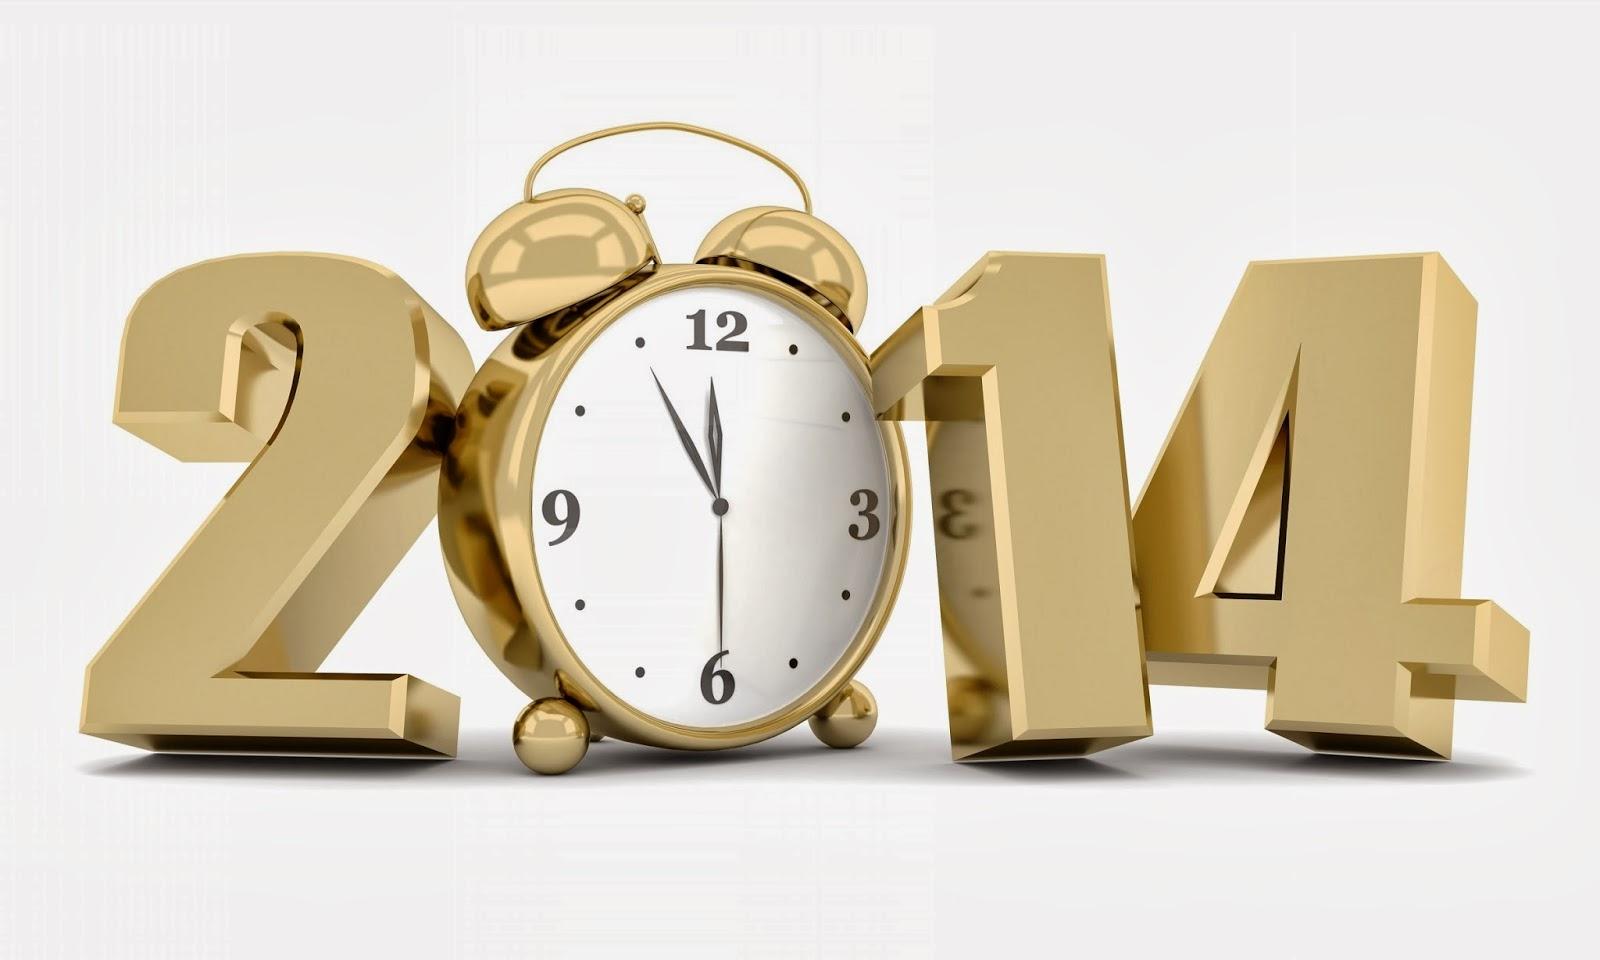 Año Nuevo 2014 muy cercano con reloj